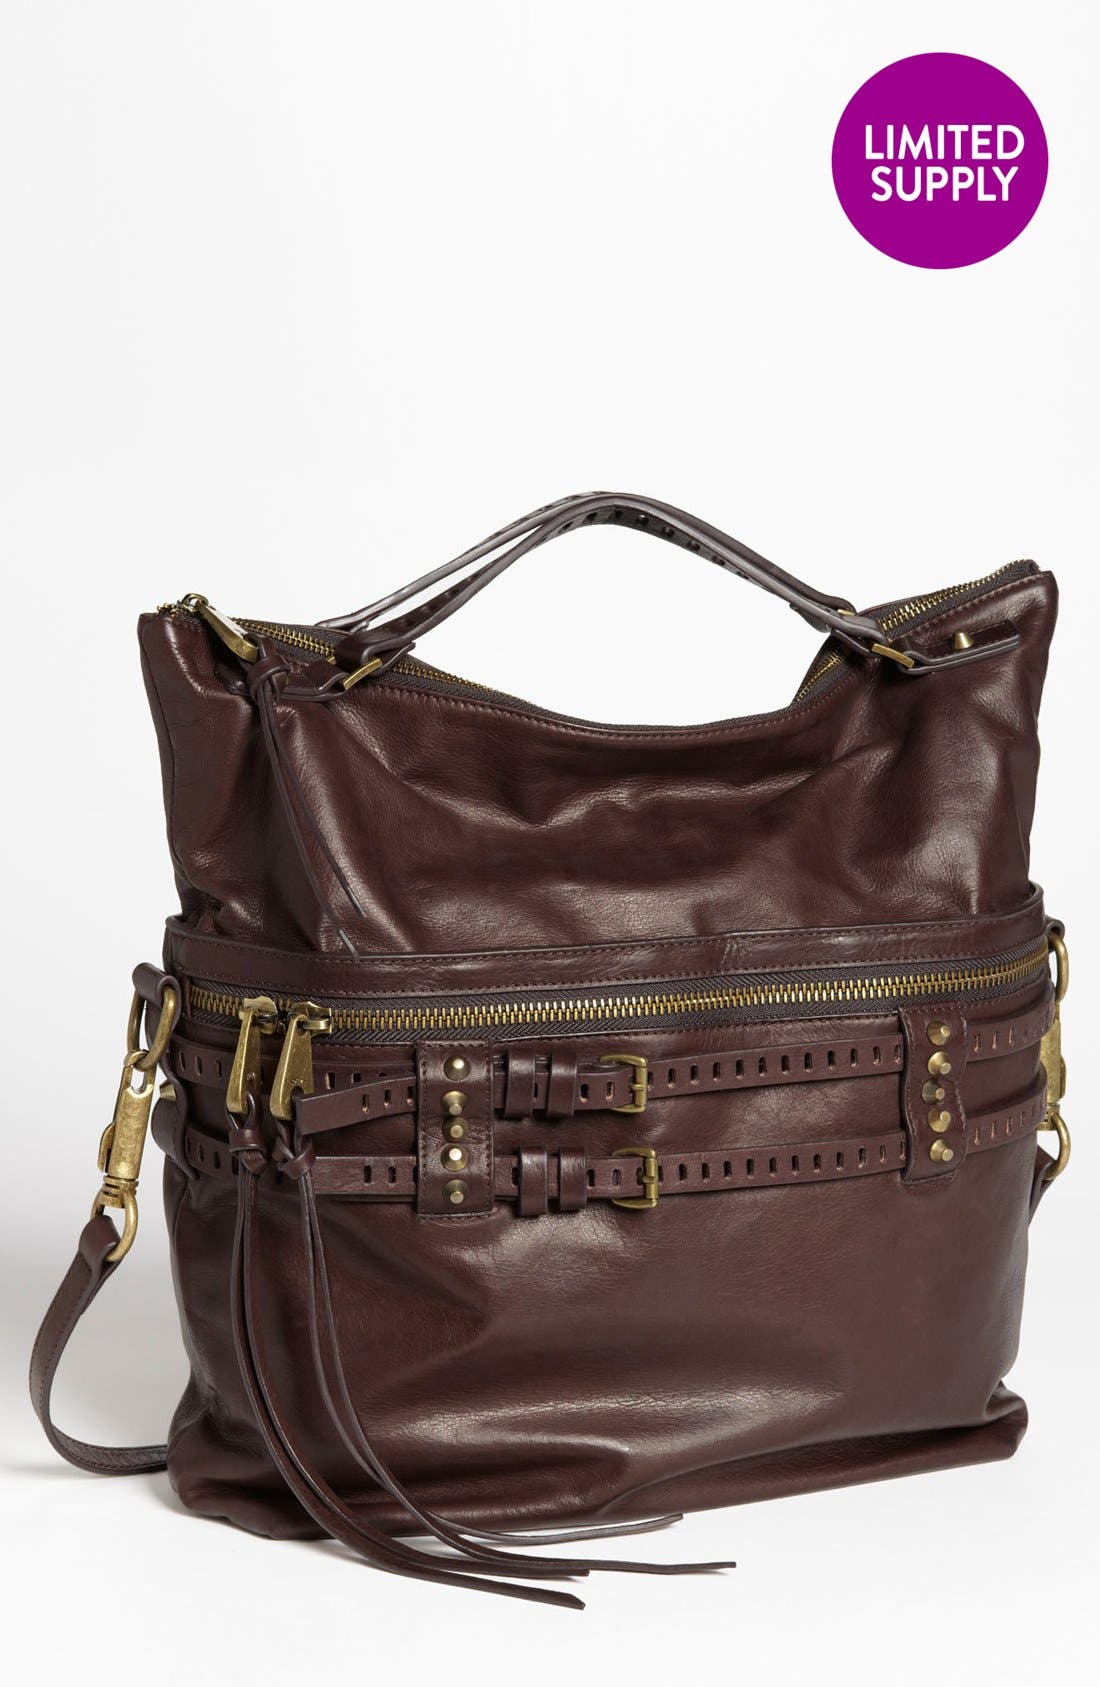 Alternate Image 1 Selected - Joelle Hawkens by Treesje® 'Victory' Shoulder Bag, Large